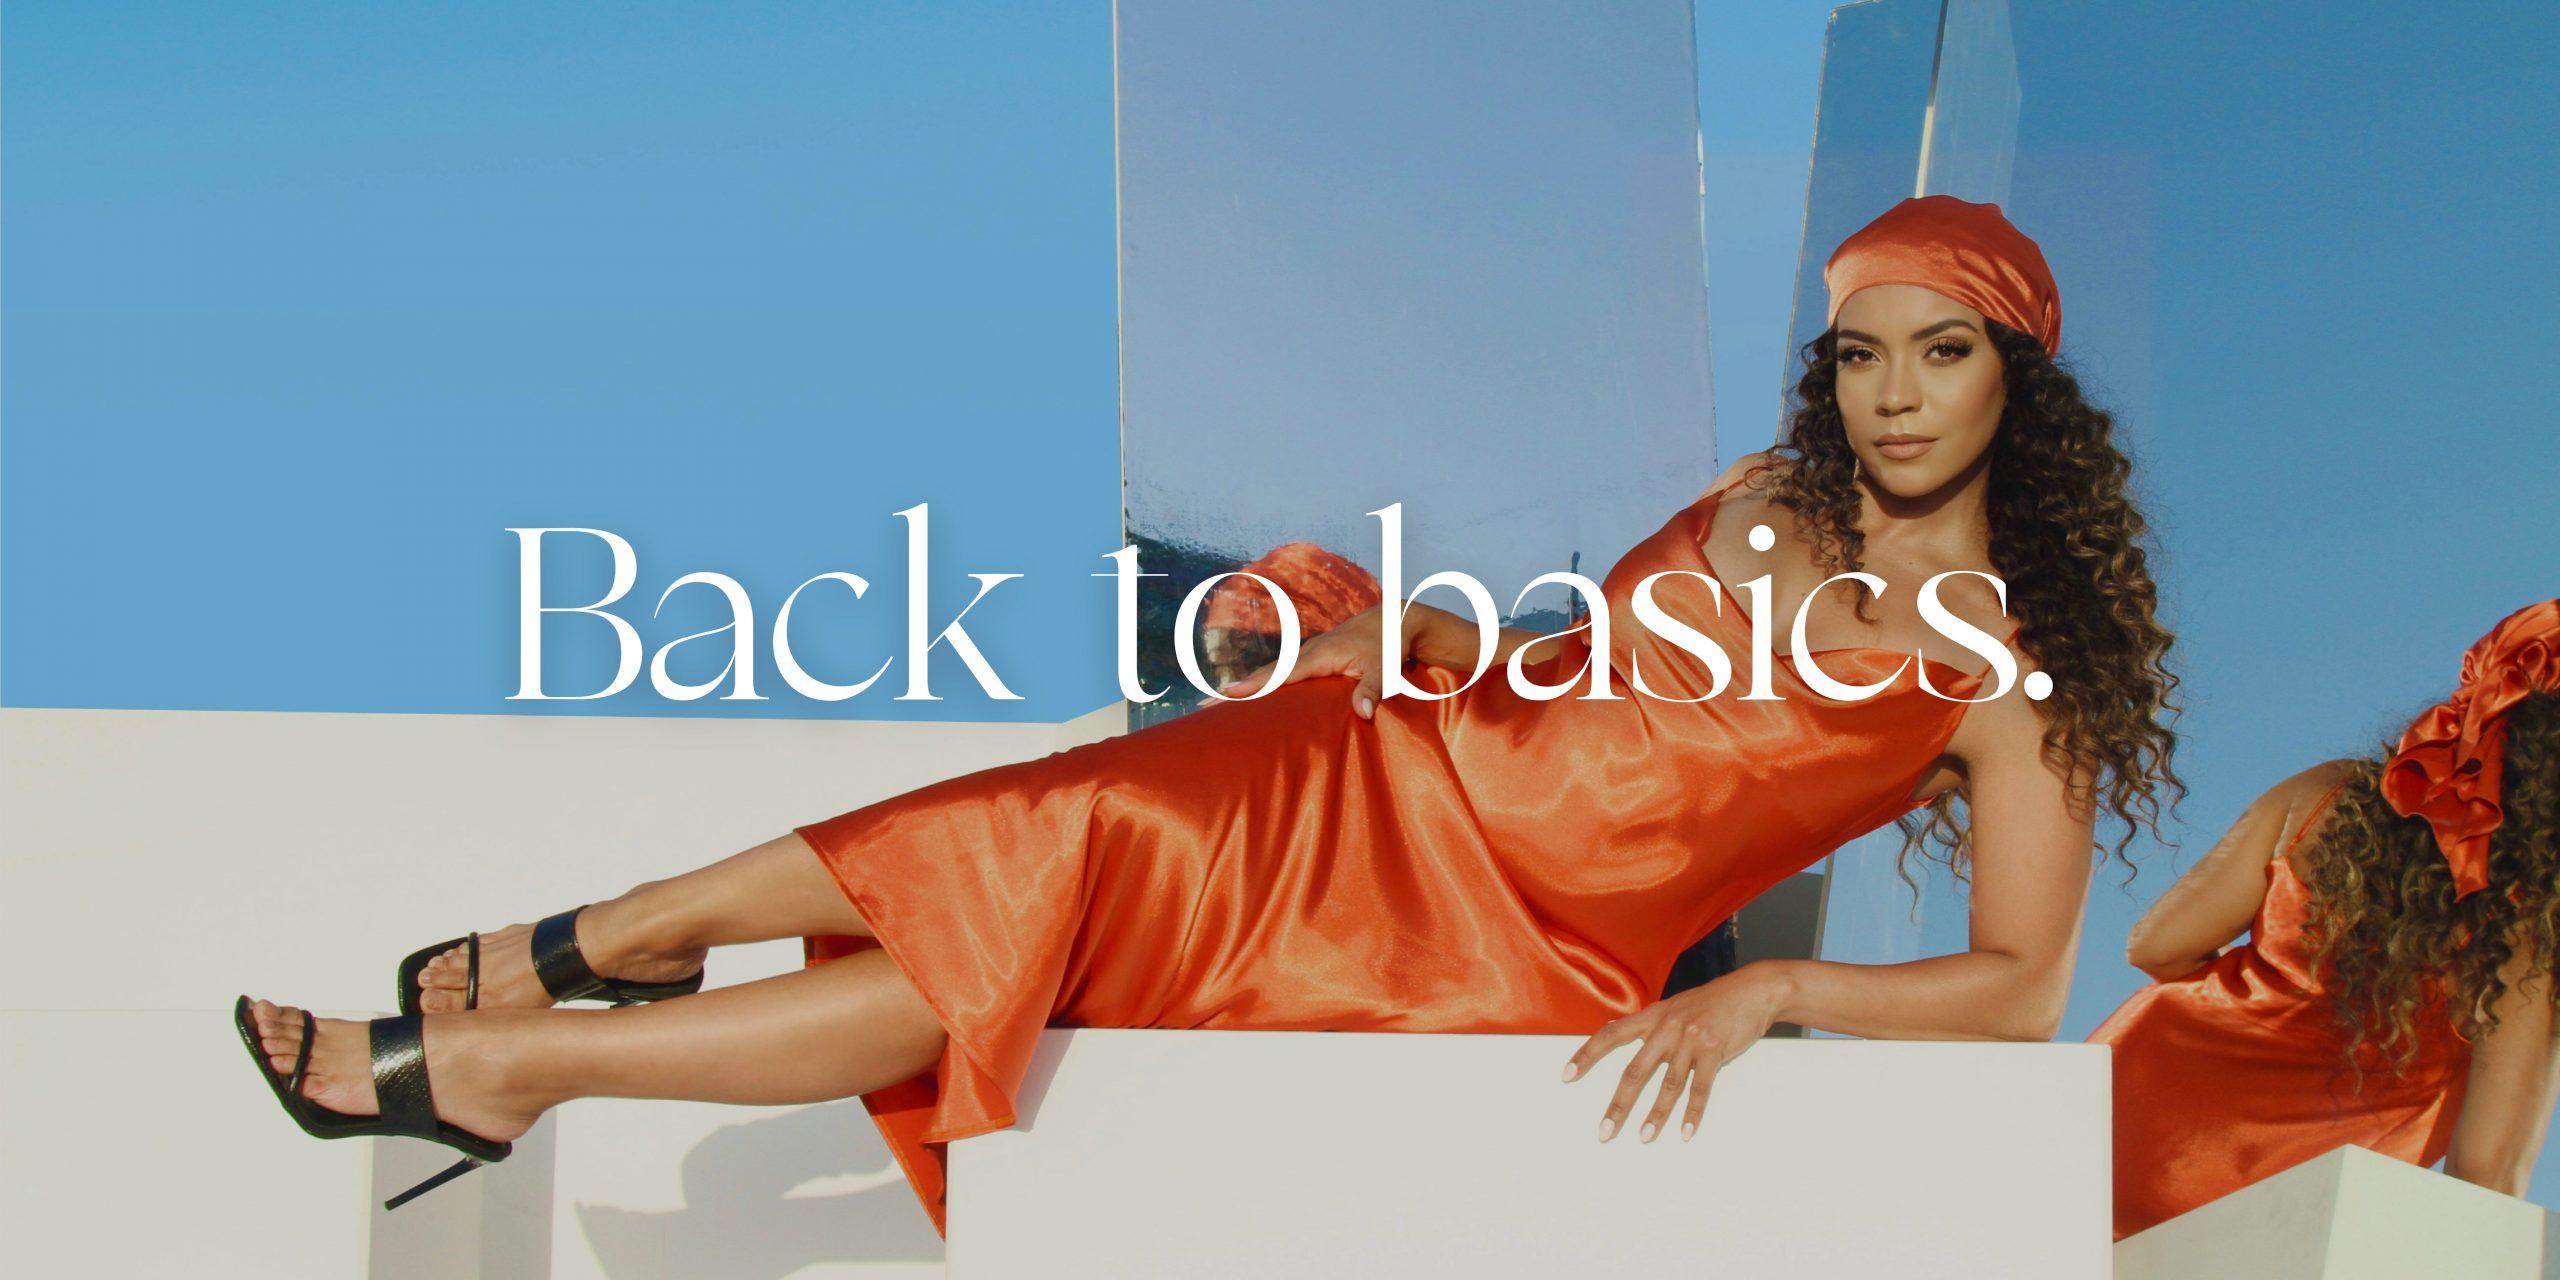 Take it back to basics with satin slip dresses